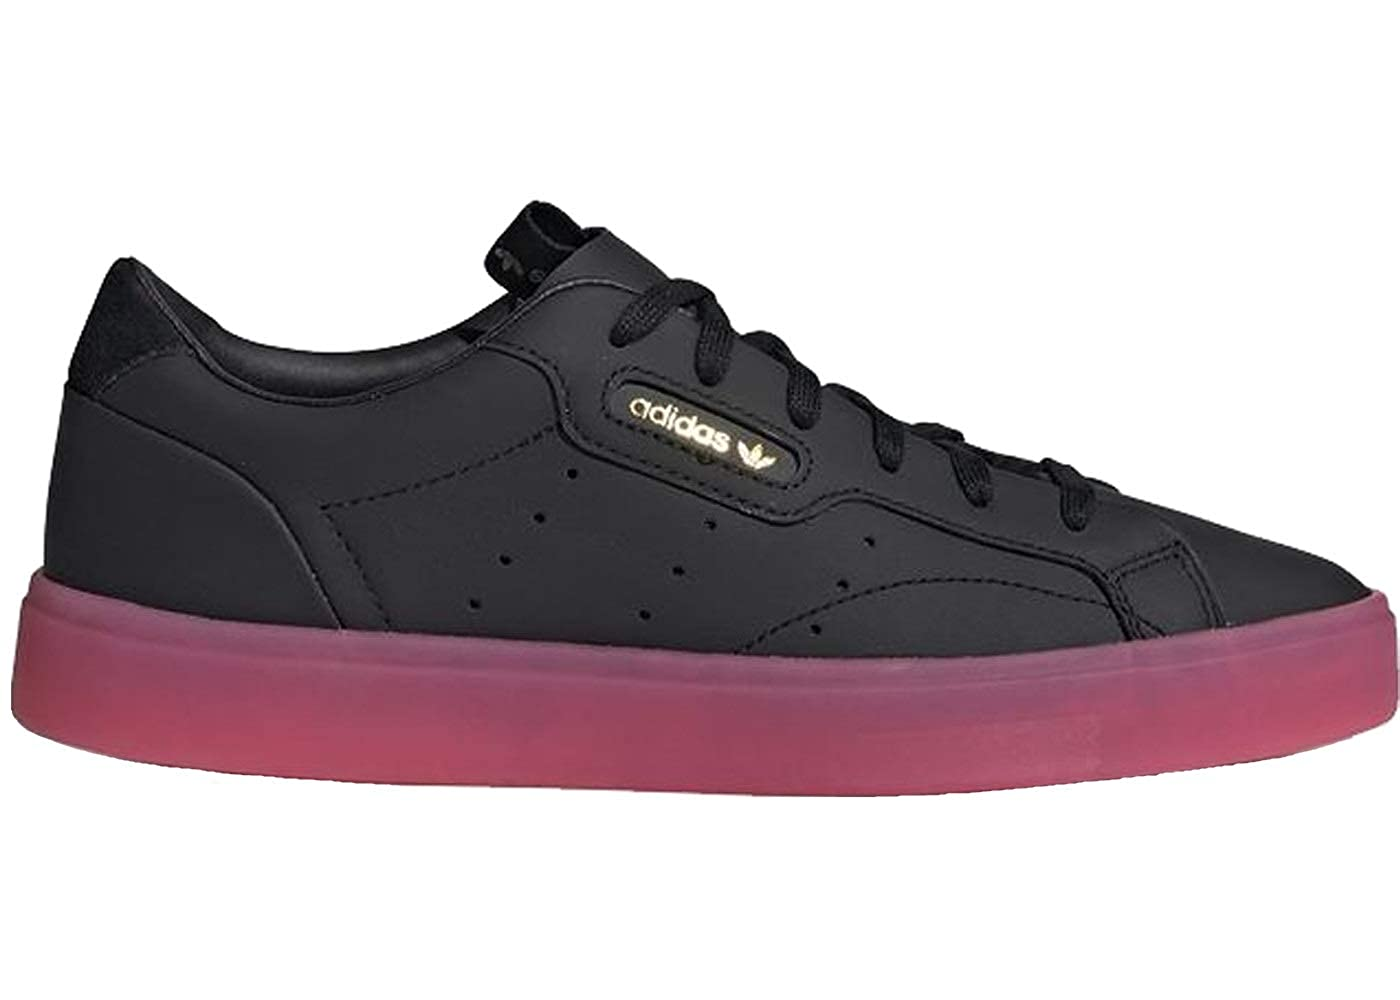 Adidas Originals Sleek W, Scarpe da Donna, scarpe da da da ginnastica Donna, nero rosa. 9a0753